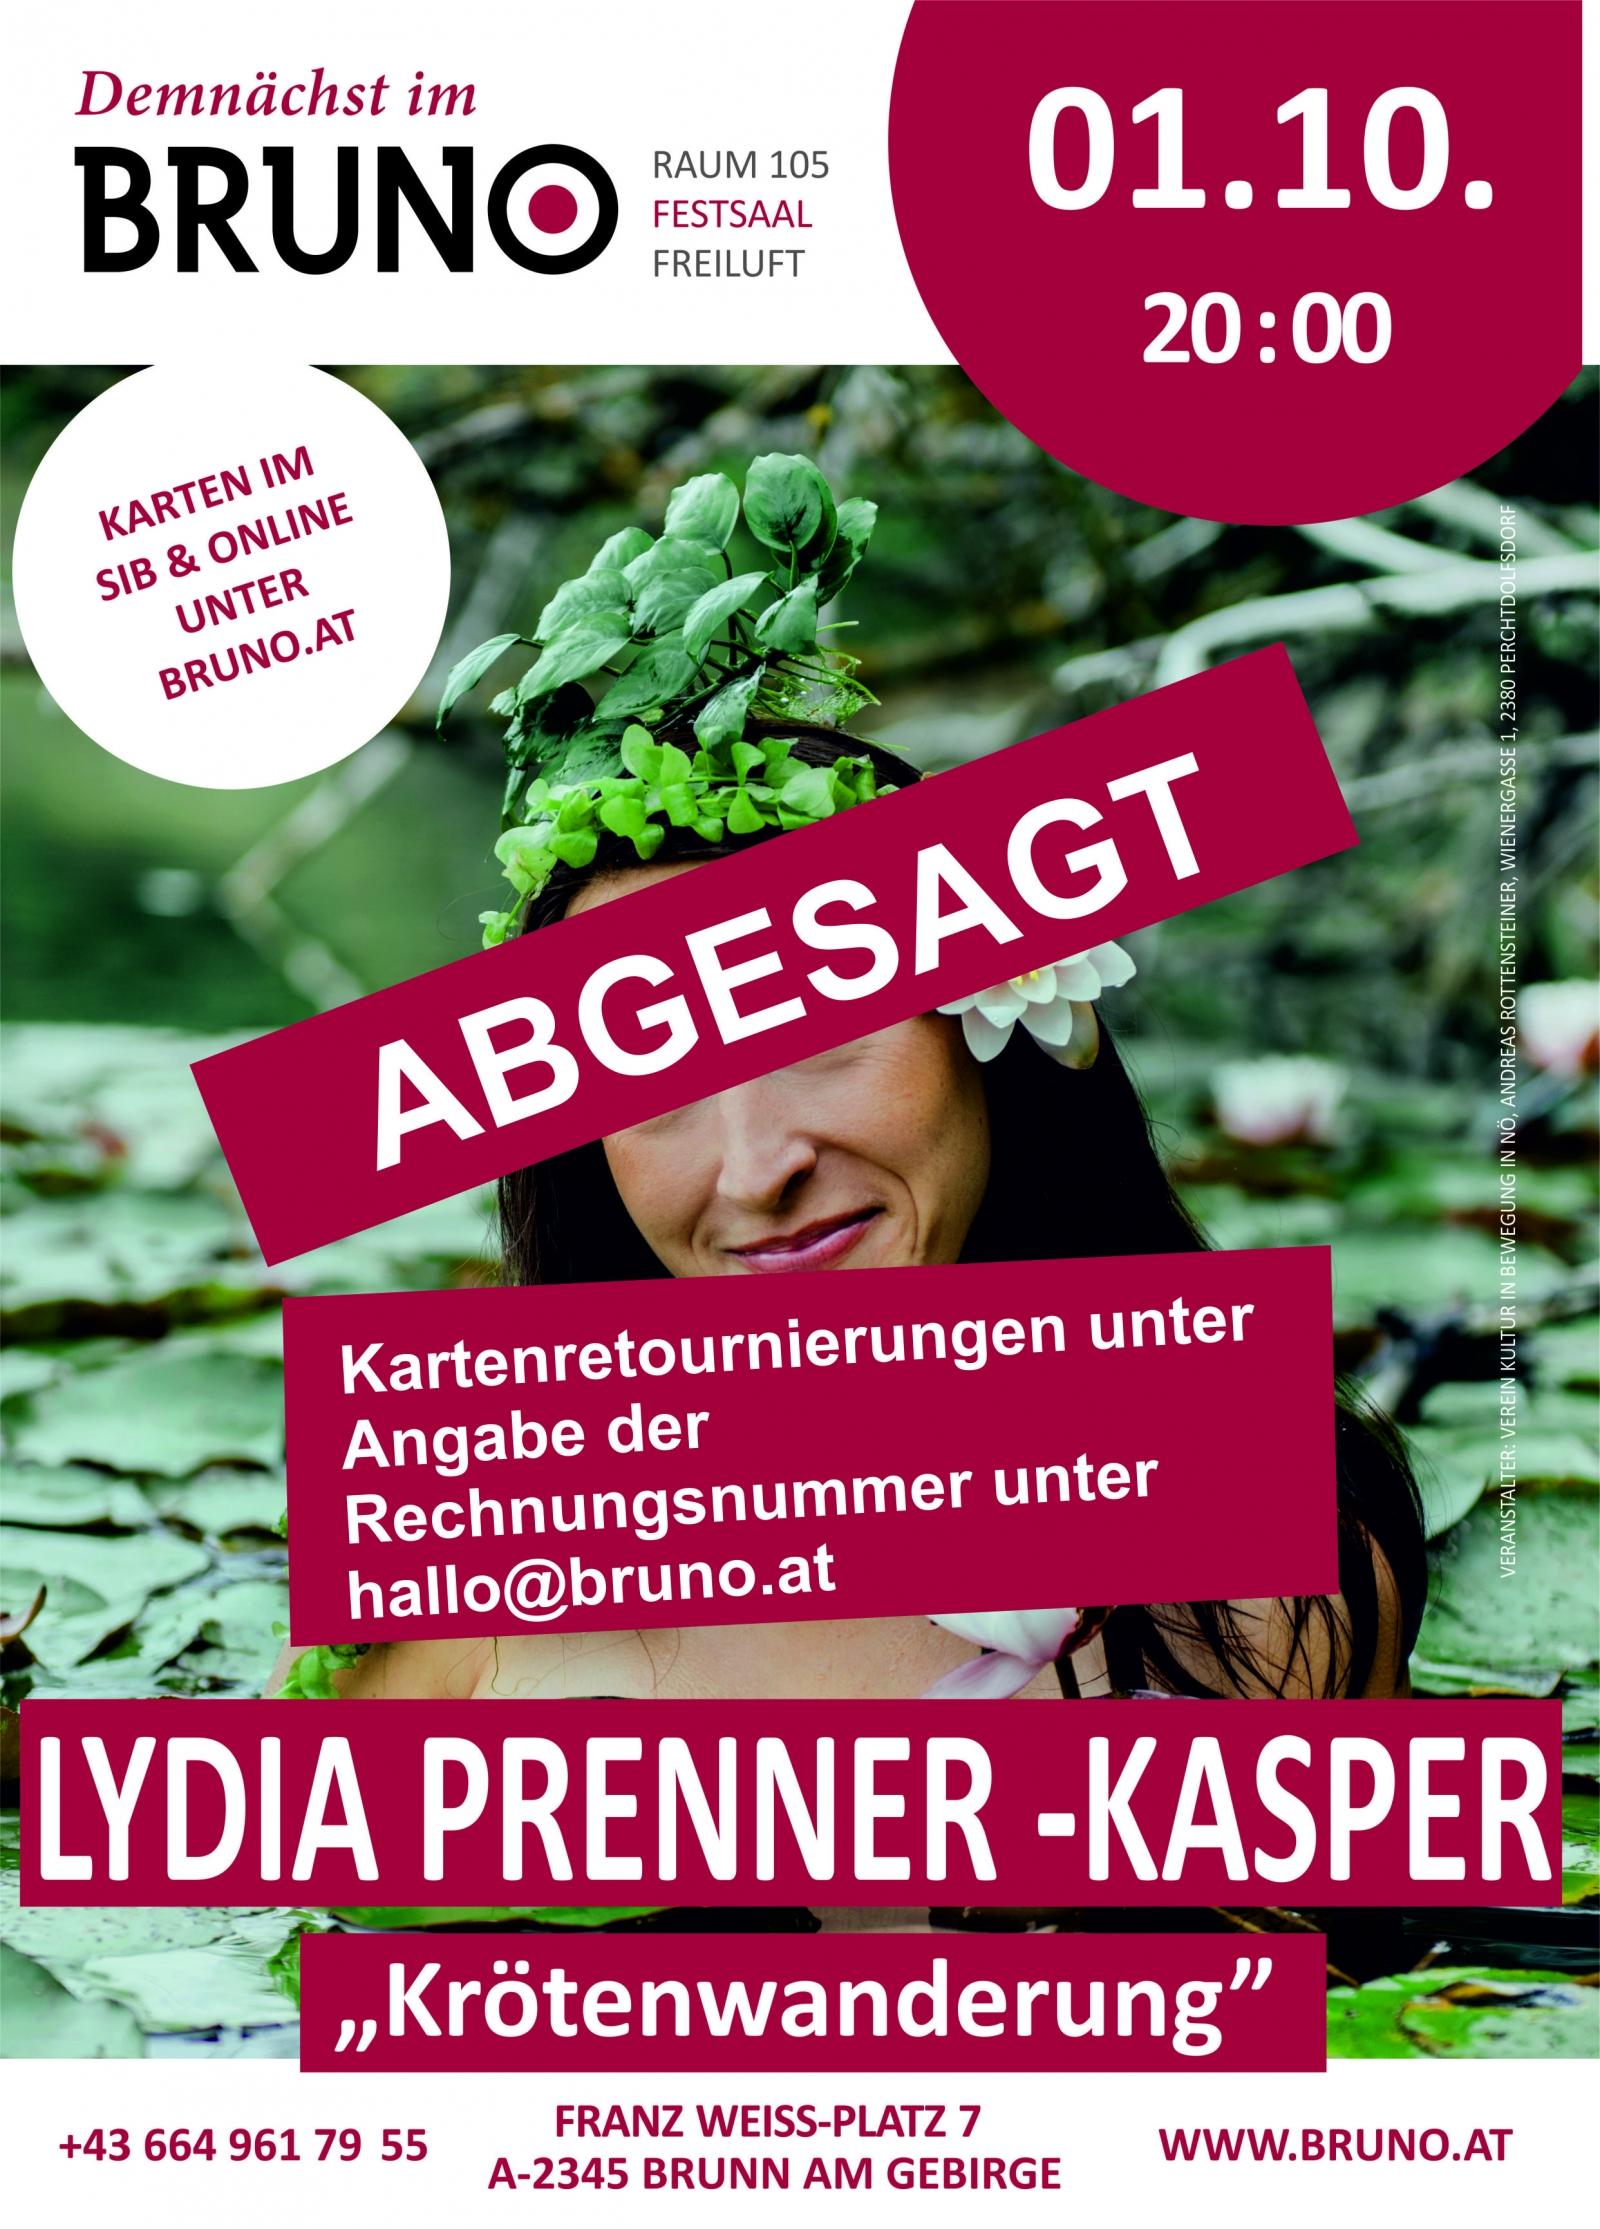 Lydia Prenner - Kasper - Krötenwanderung